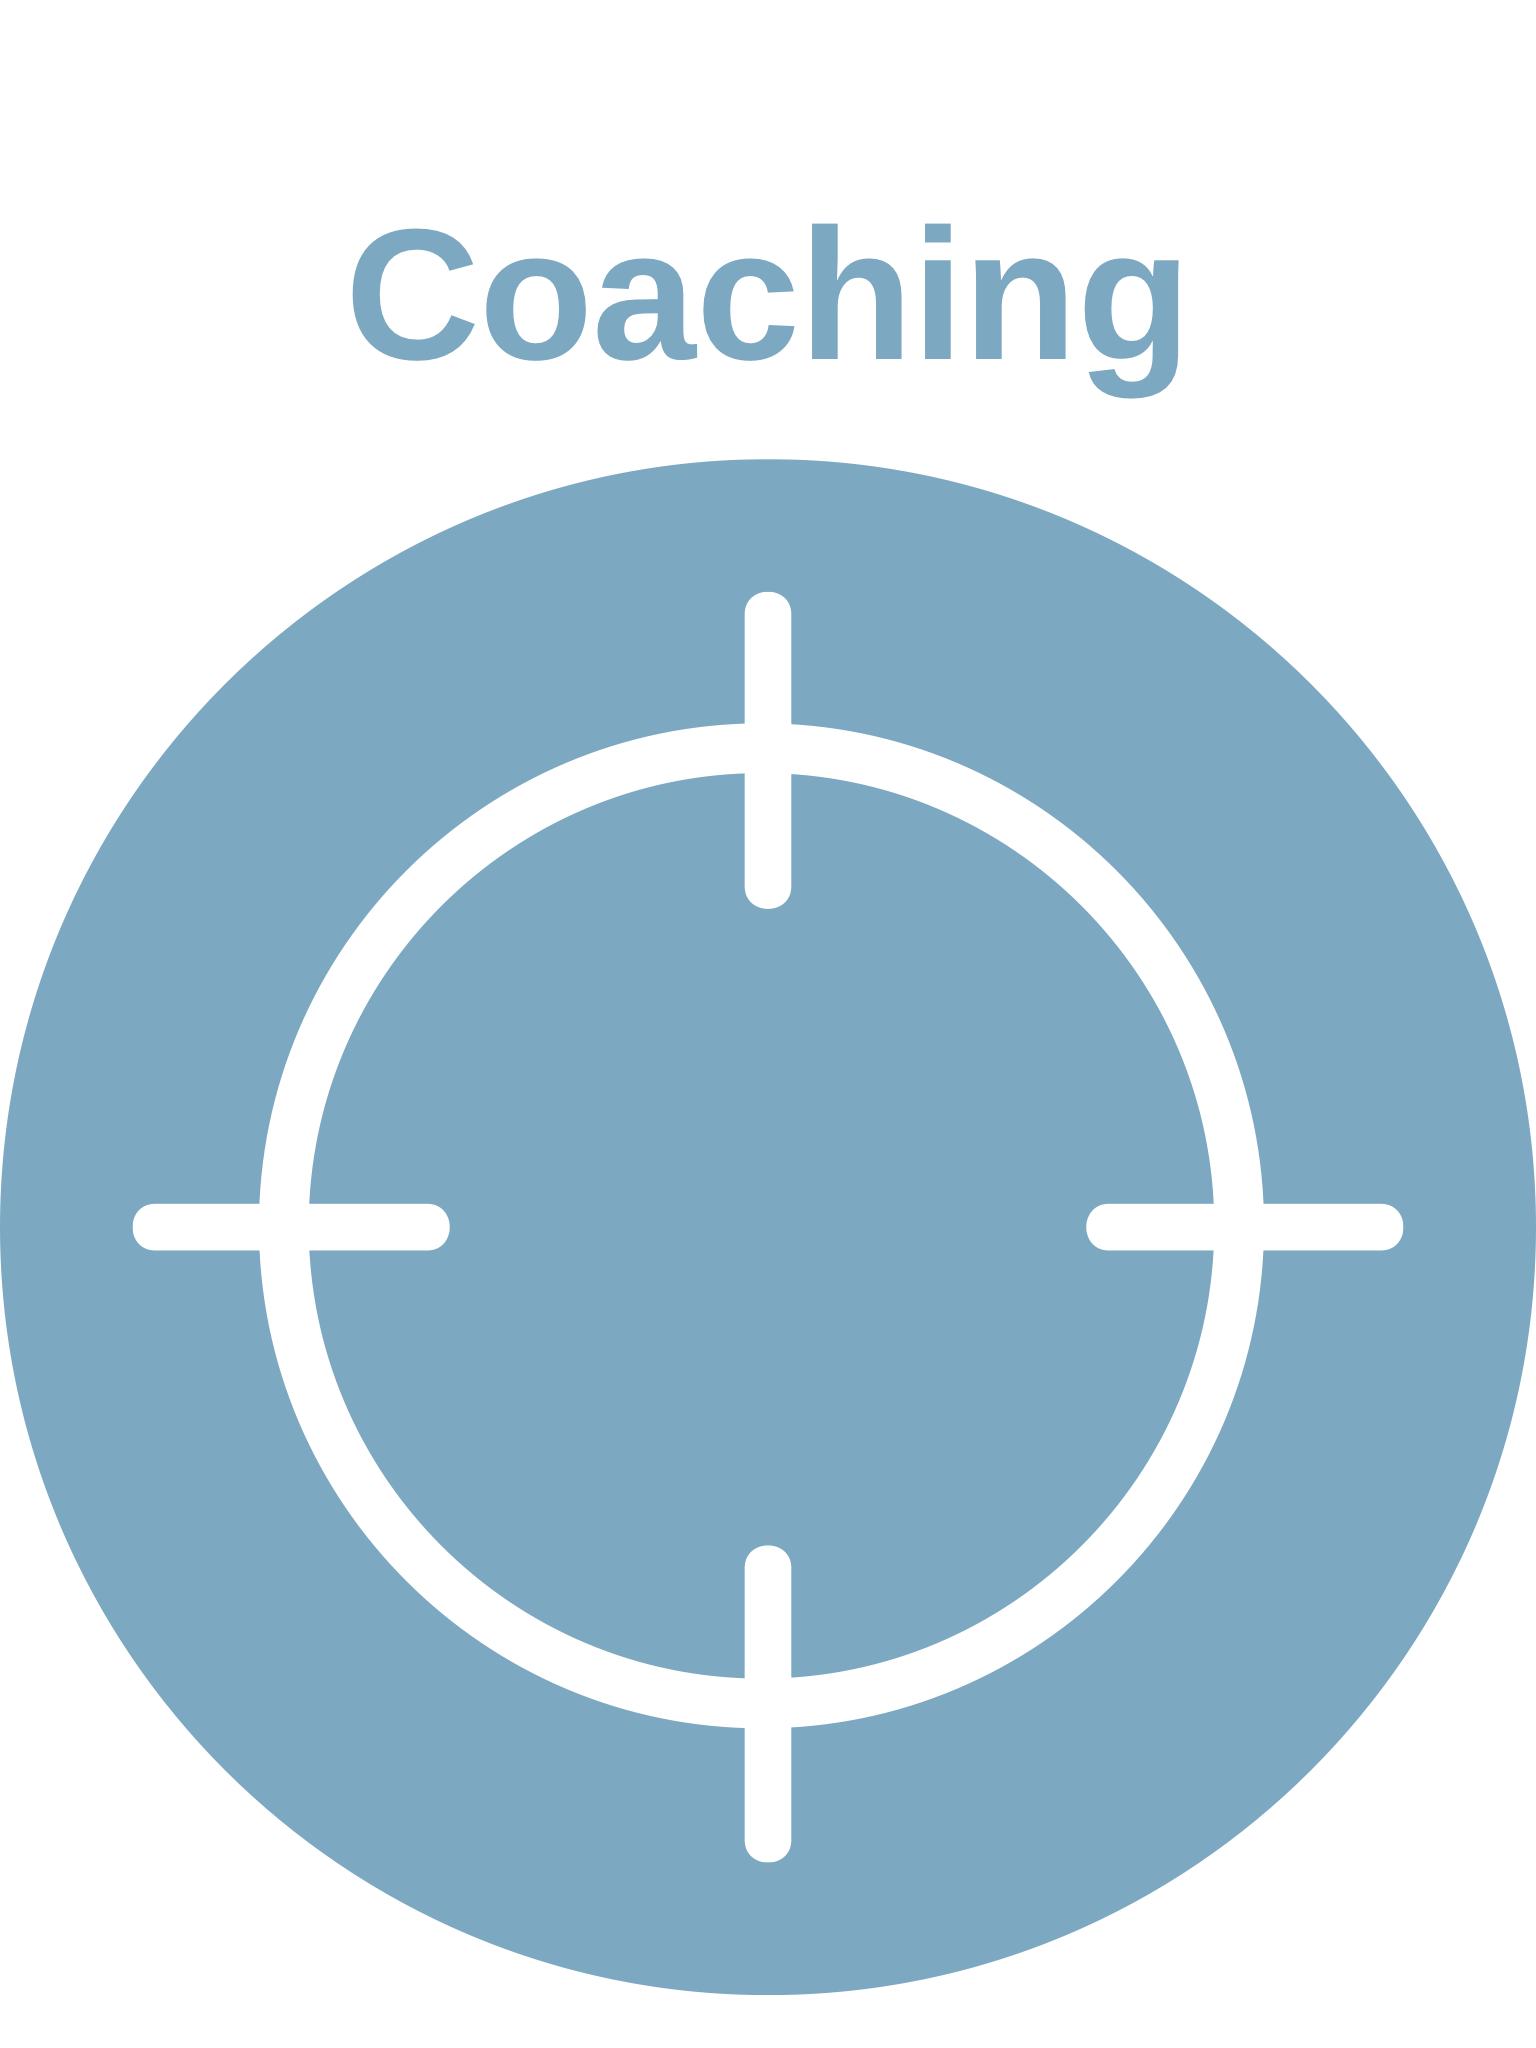 Career and executive coaching